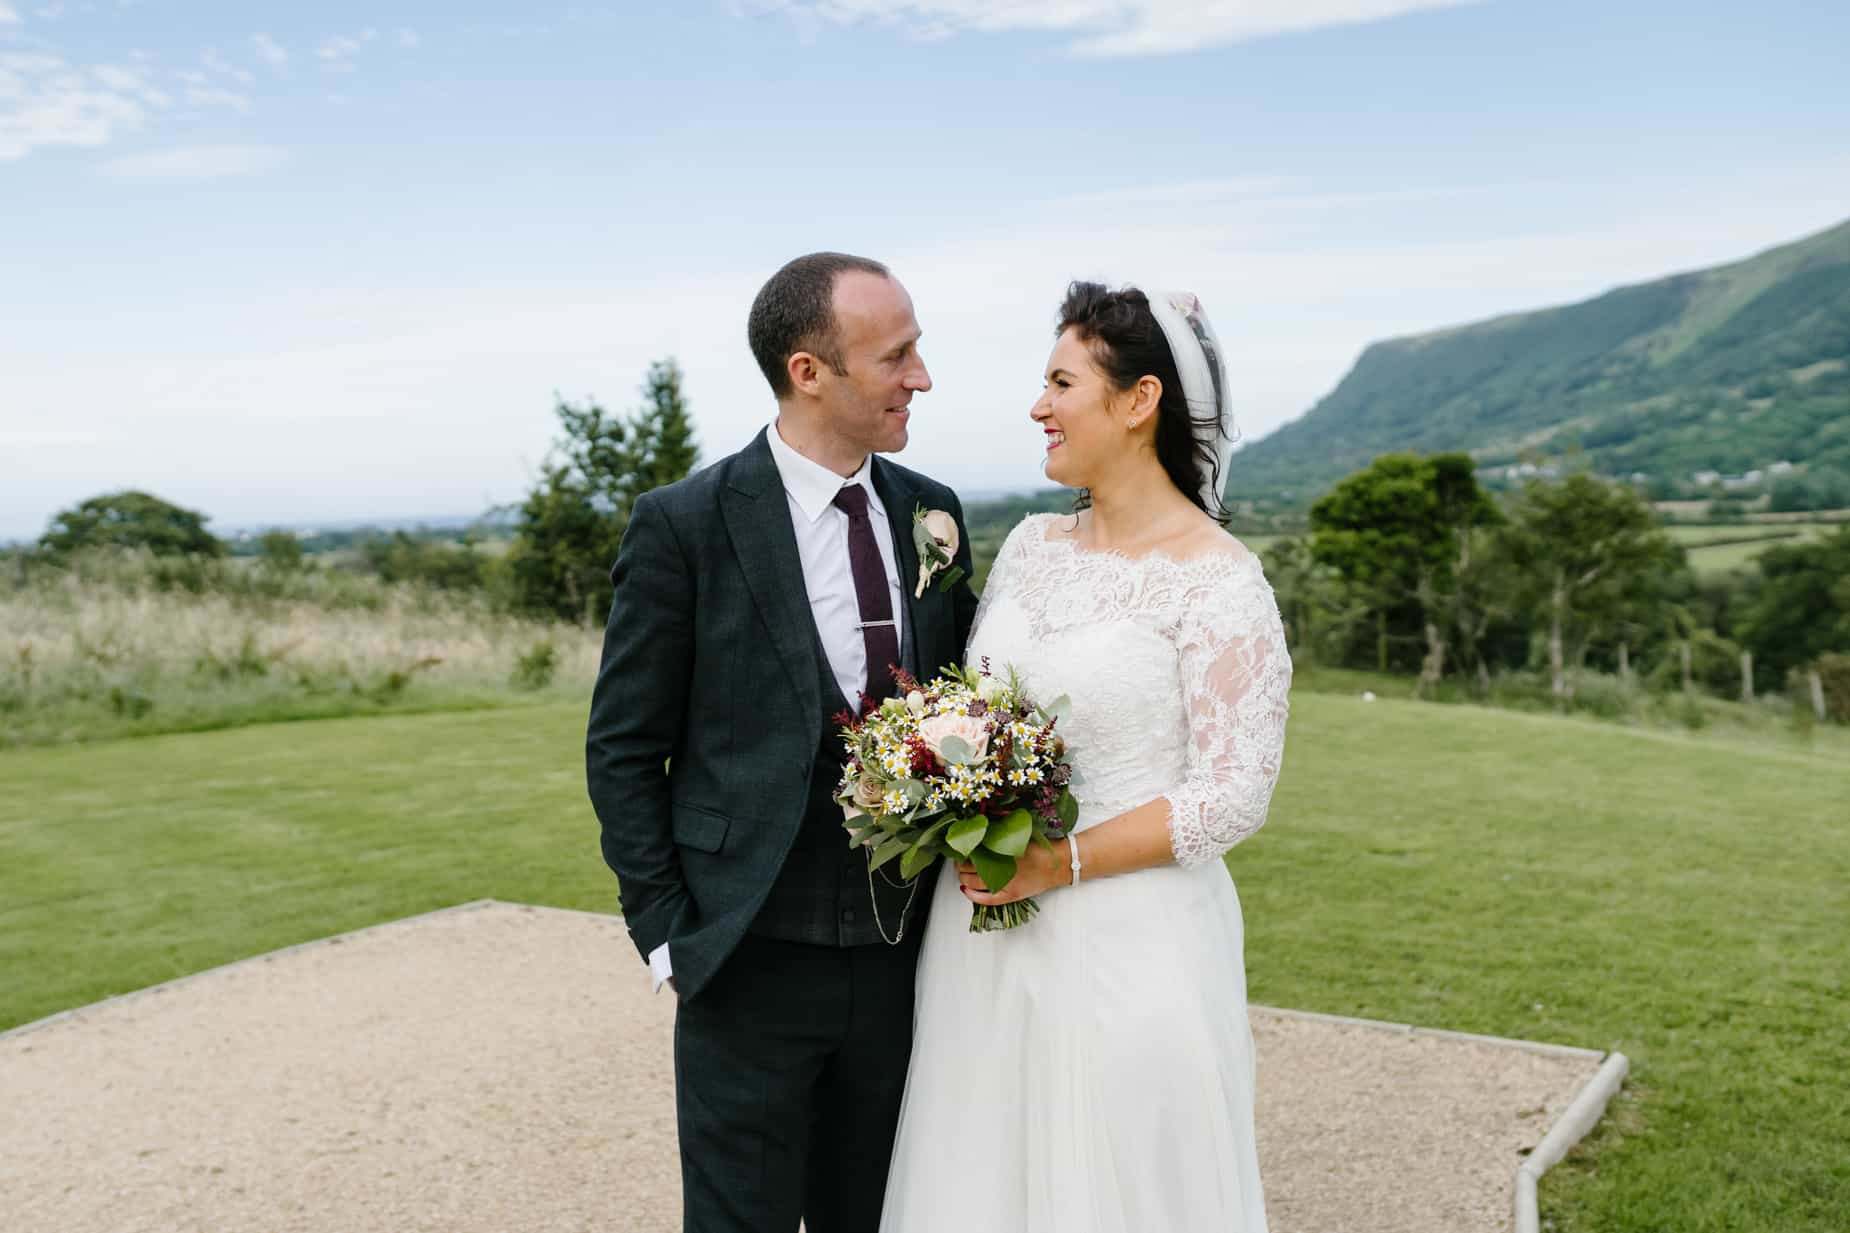 Kilmore House wedding photography